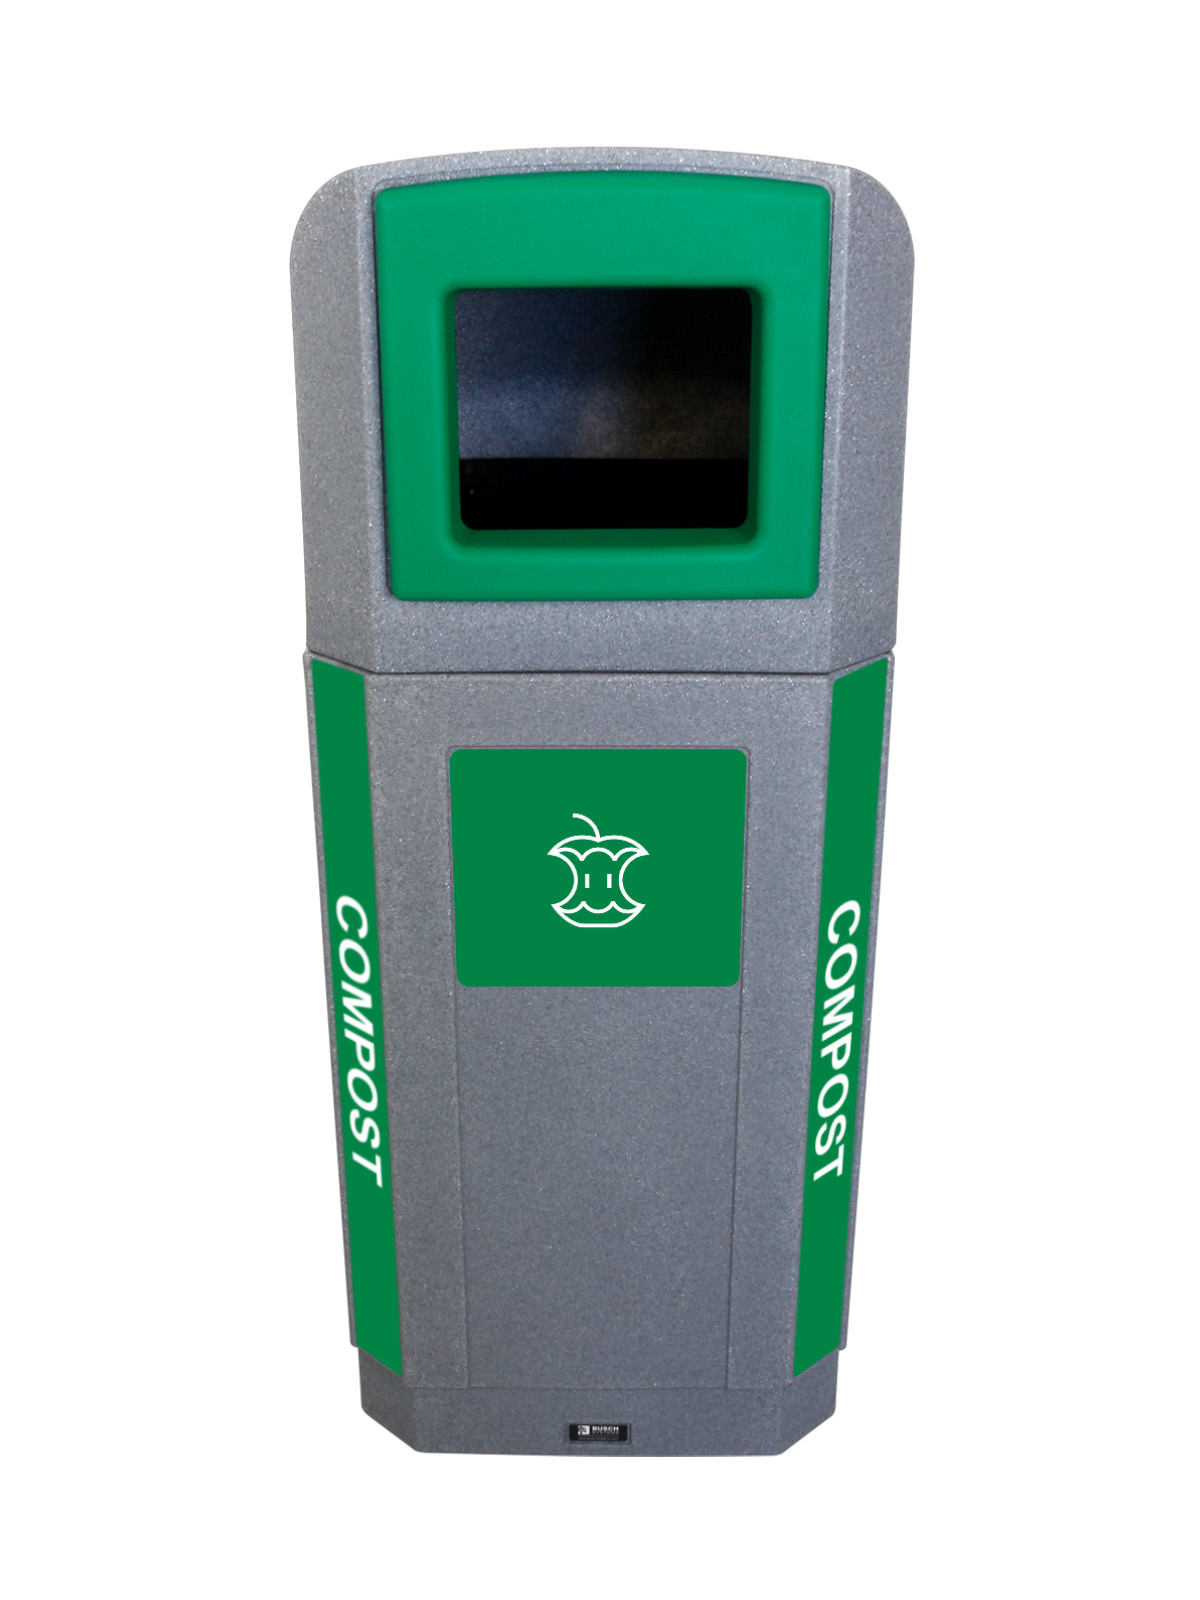 OCTO - Single - Outdoor - Compost  - Full - Greystone-Green